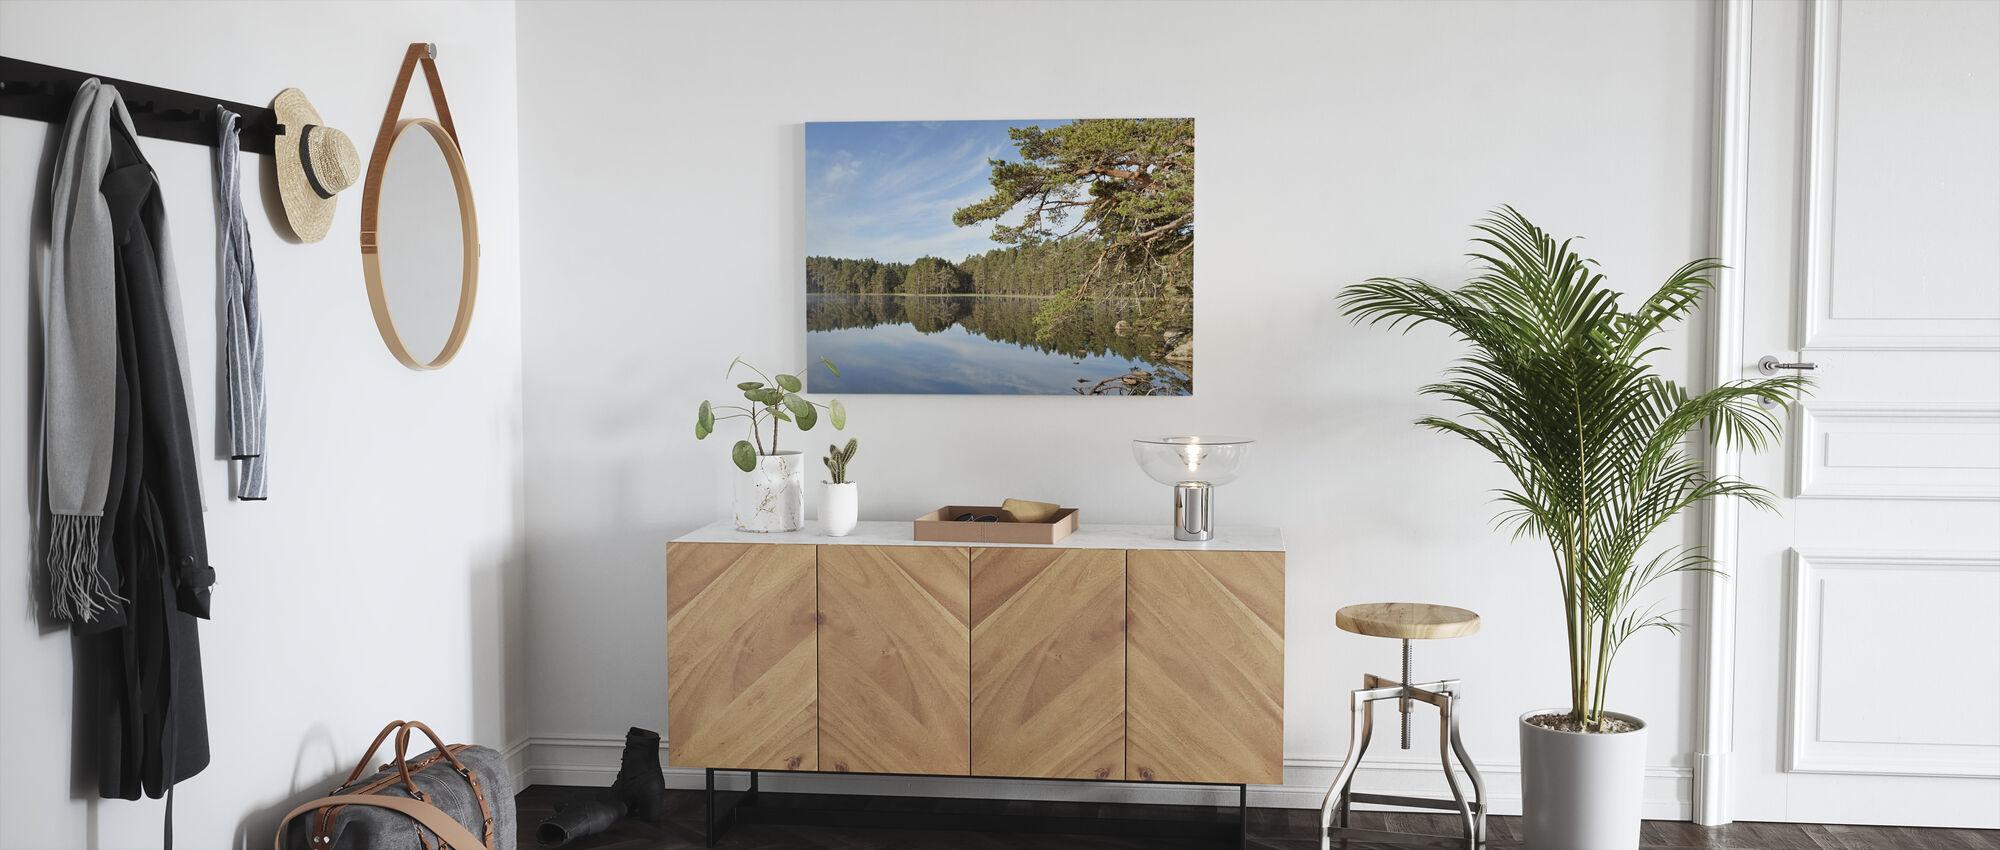 Loch Panorama - Canvastaulu - Aula